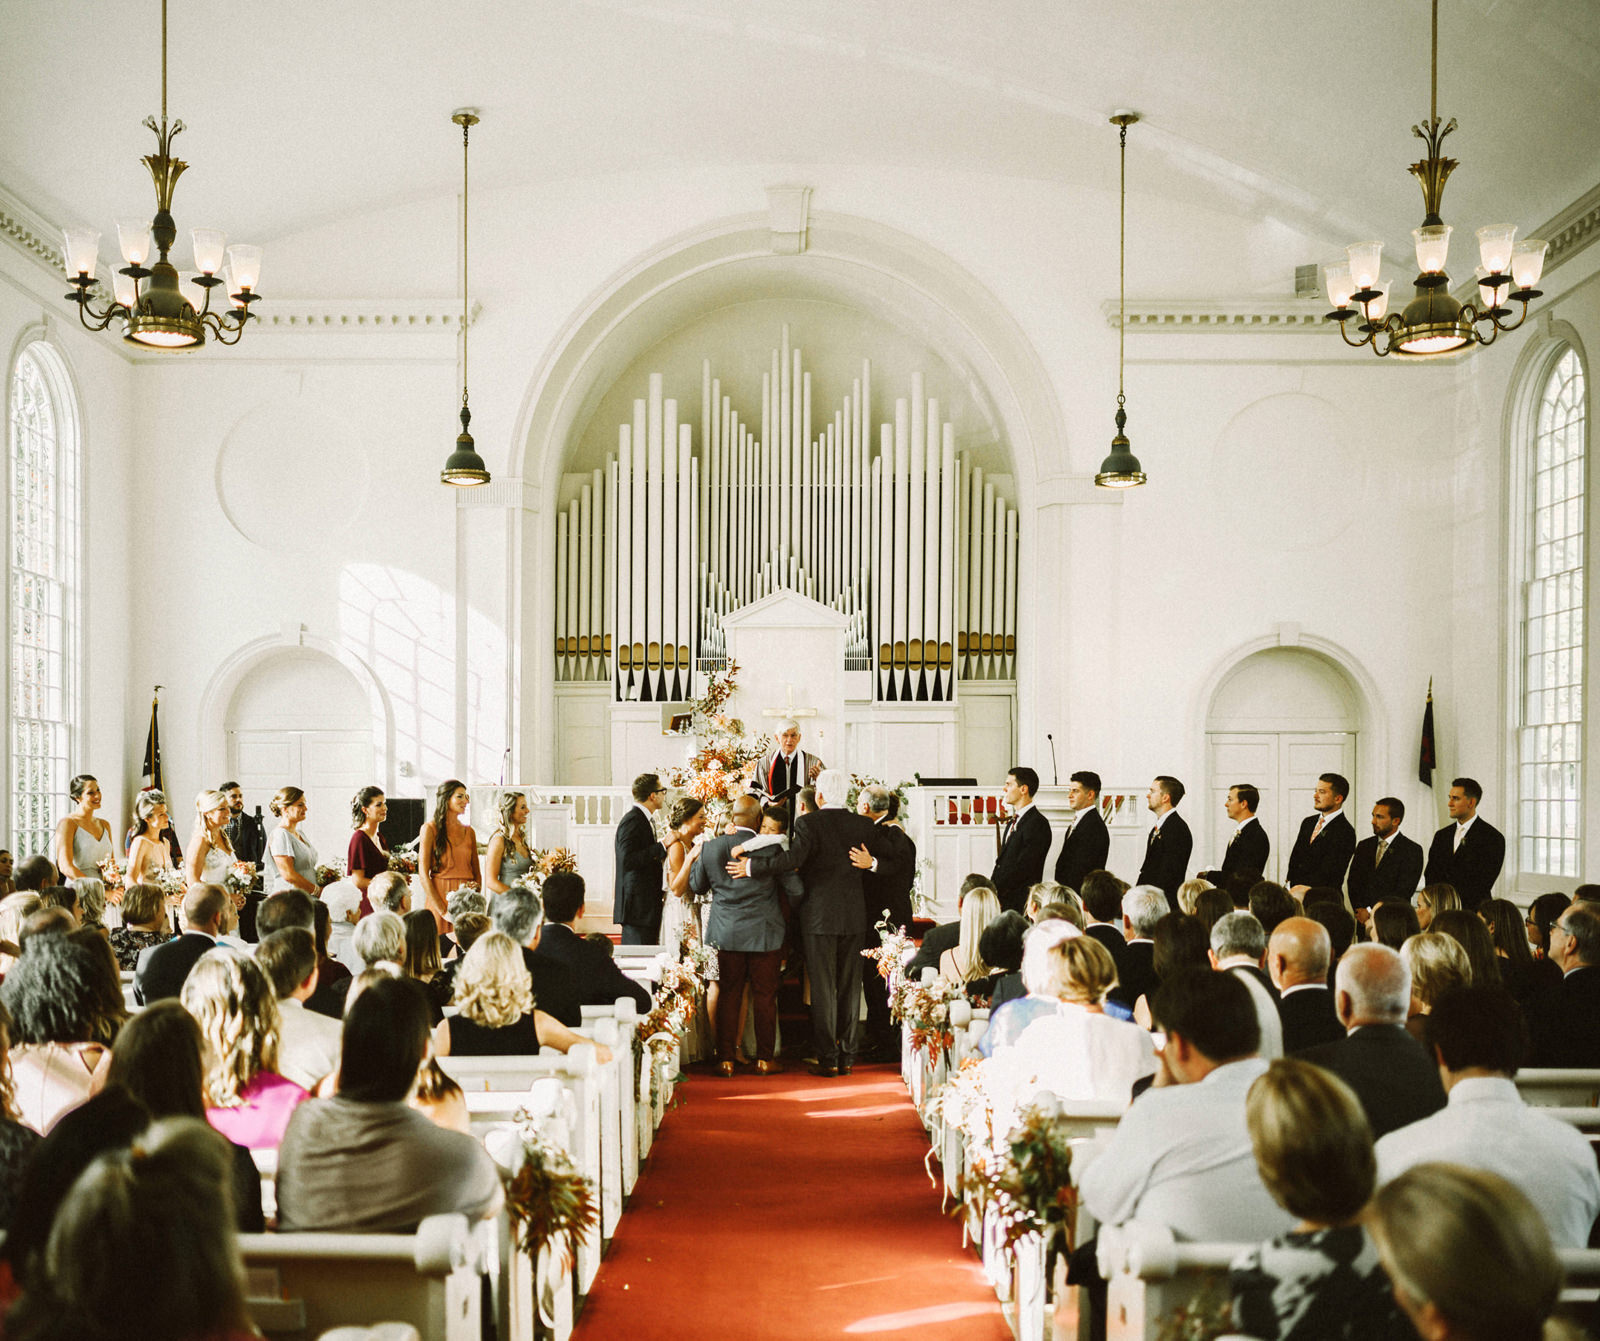 bridgeport-wedding-058 BRIDGEPORT, CONNECTICUT BACKYARD WEDDING